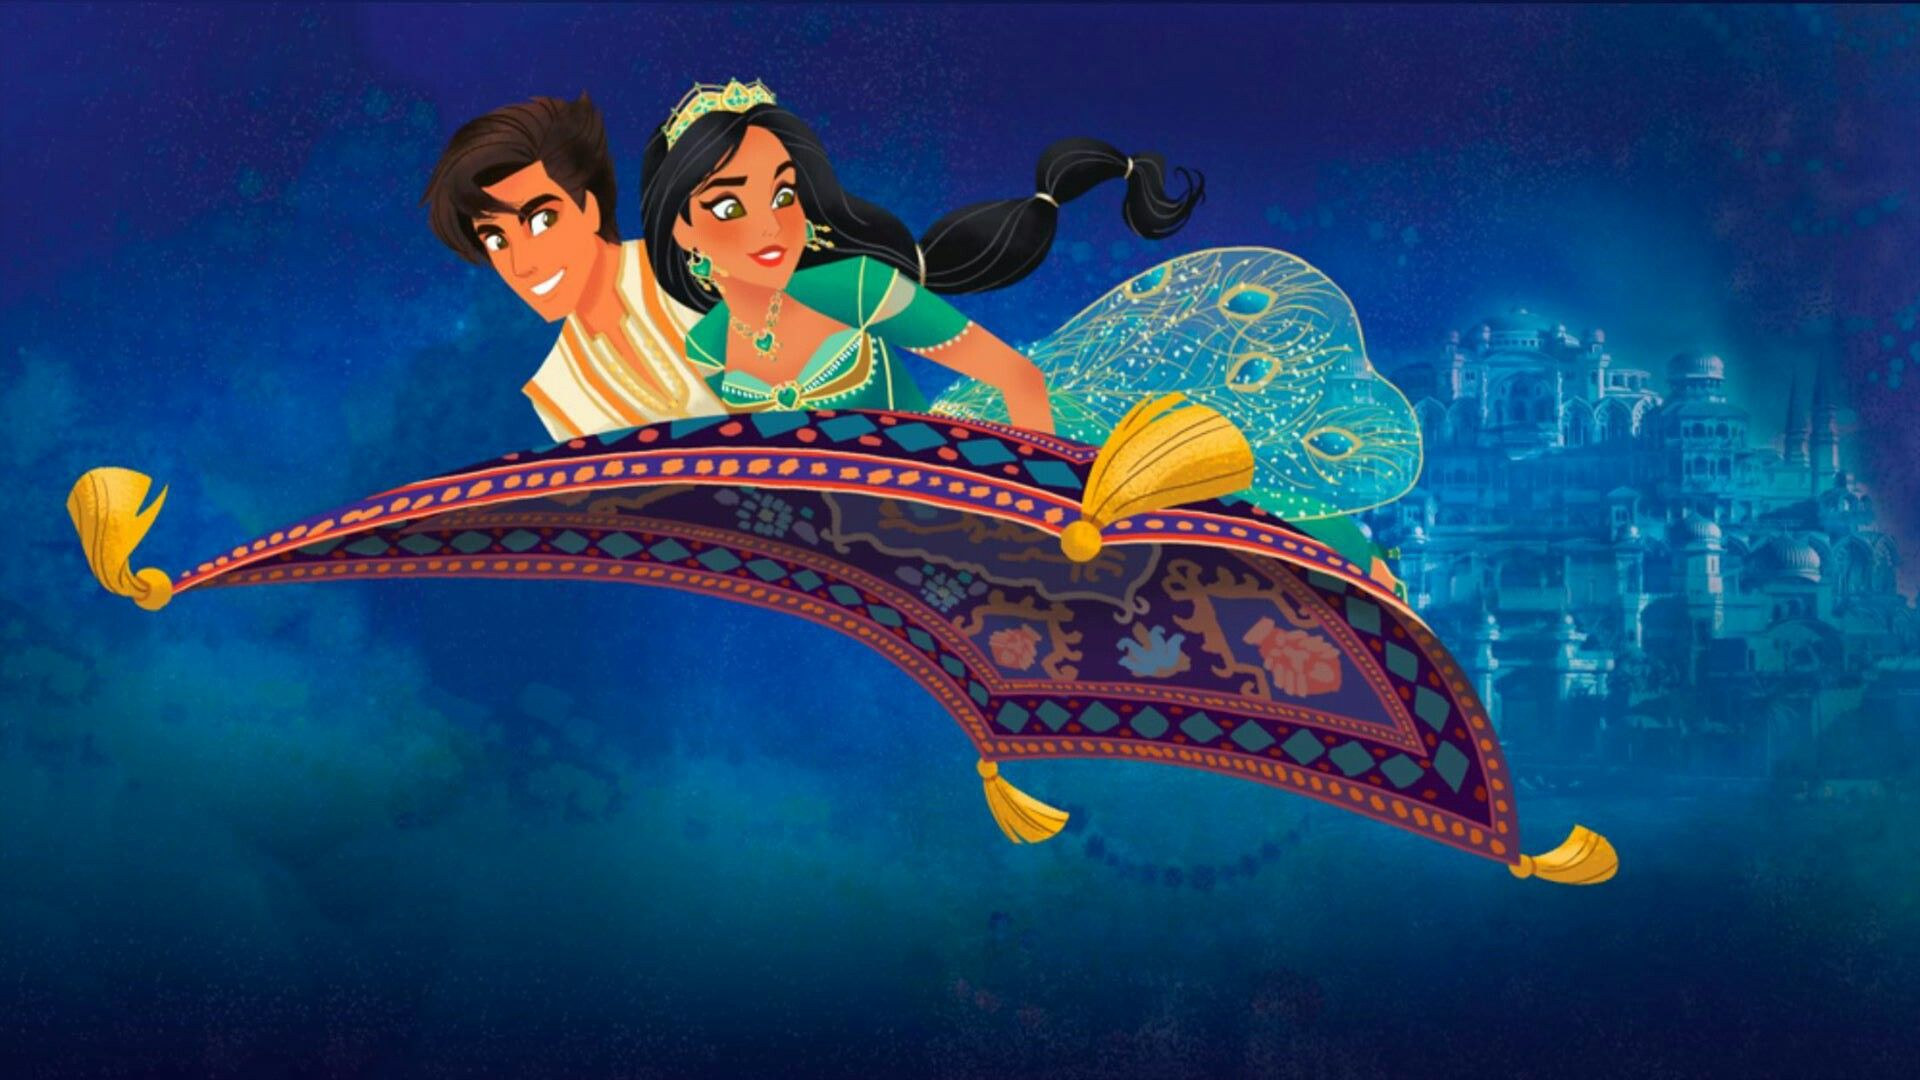 Princess Jasmine and Aladdin on the Magic Carpet ride from